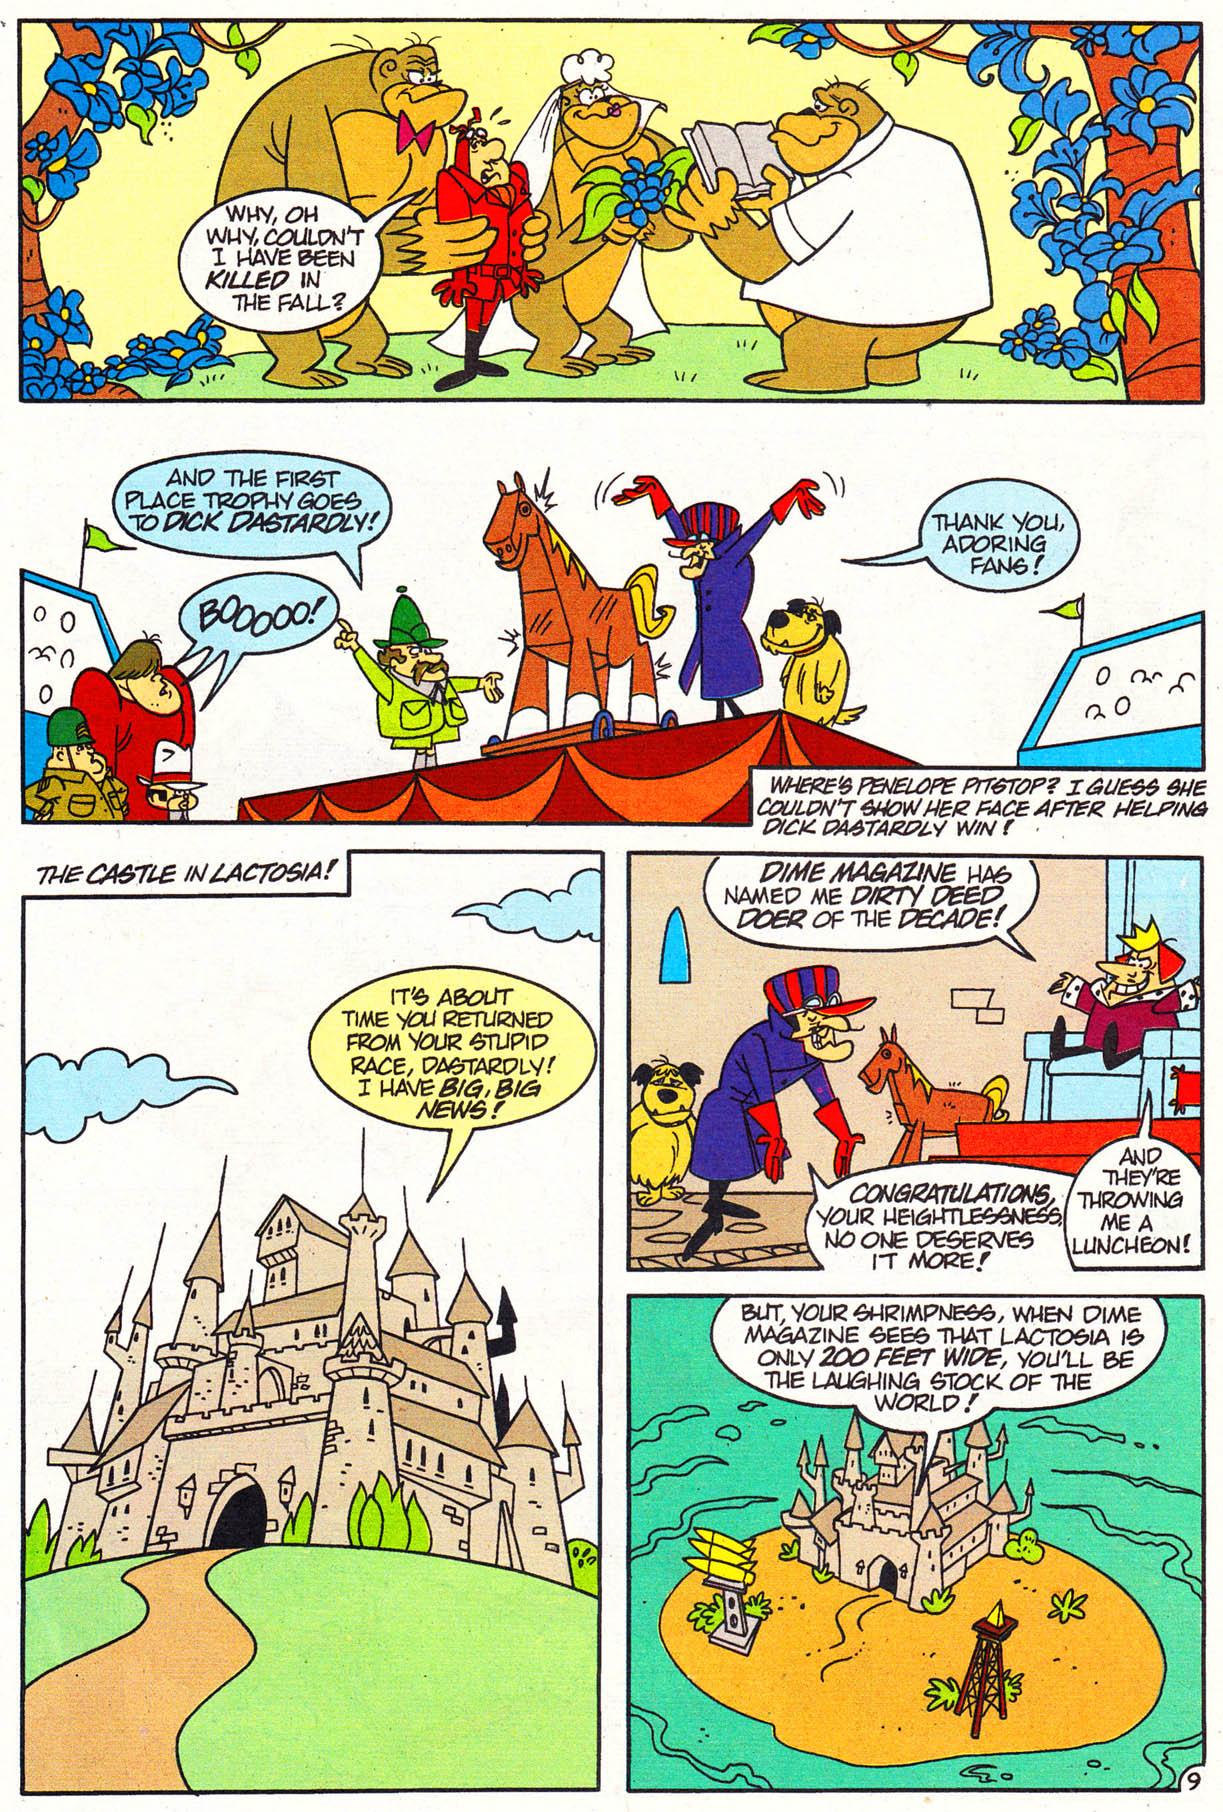 Read online Hanna-Barbera Presents comic -  Issue #2 - 28